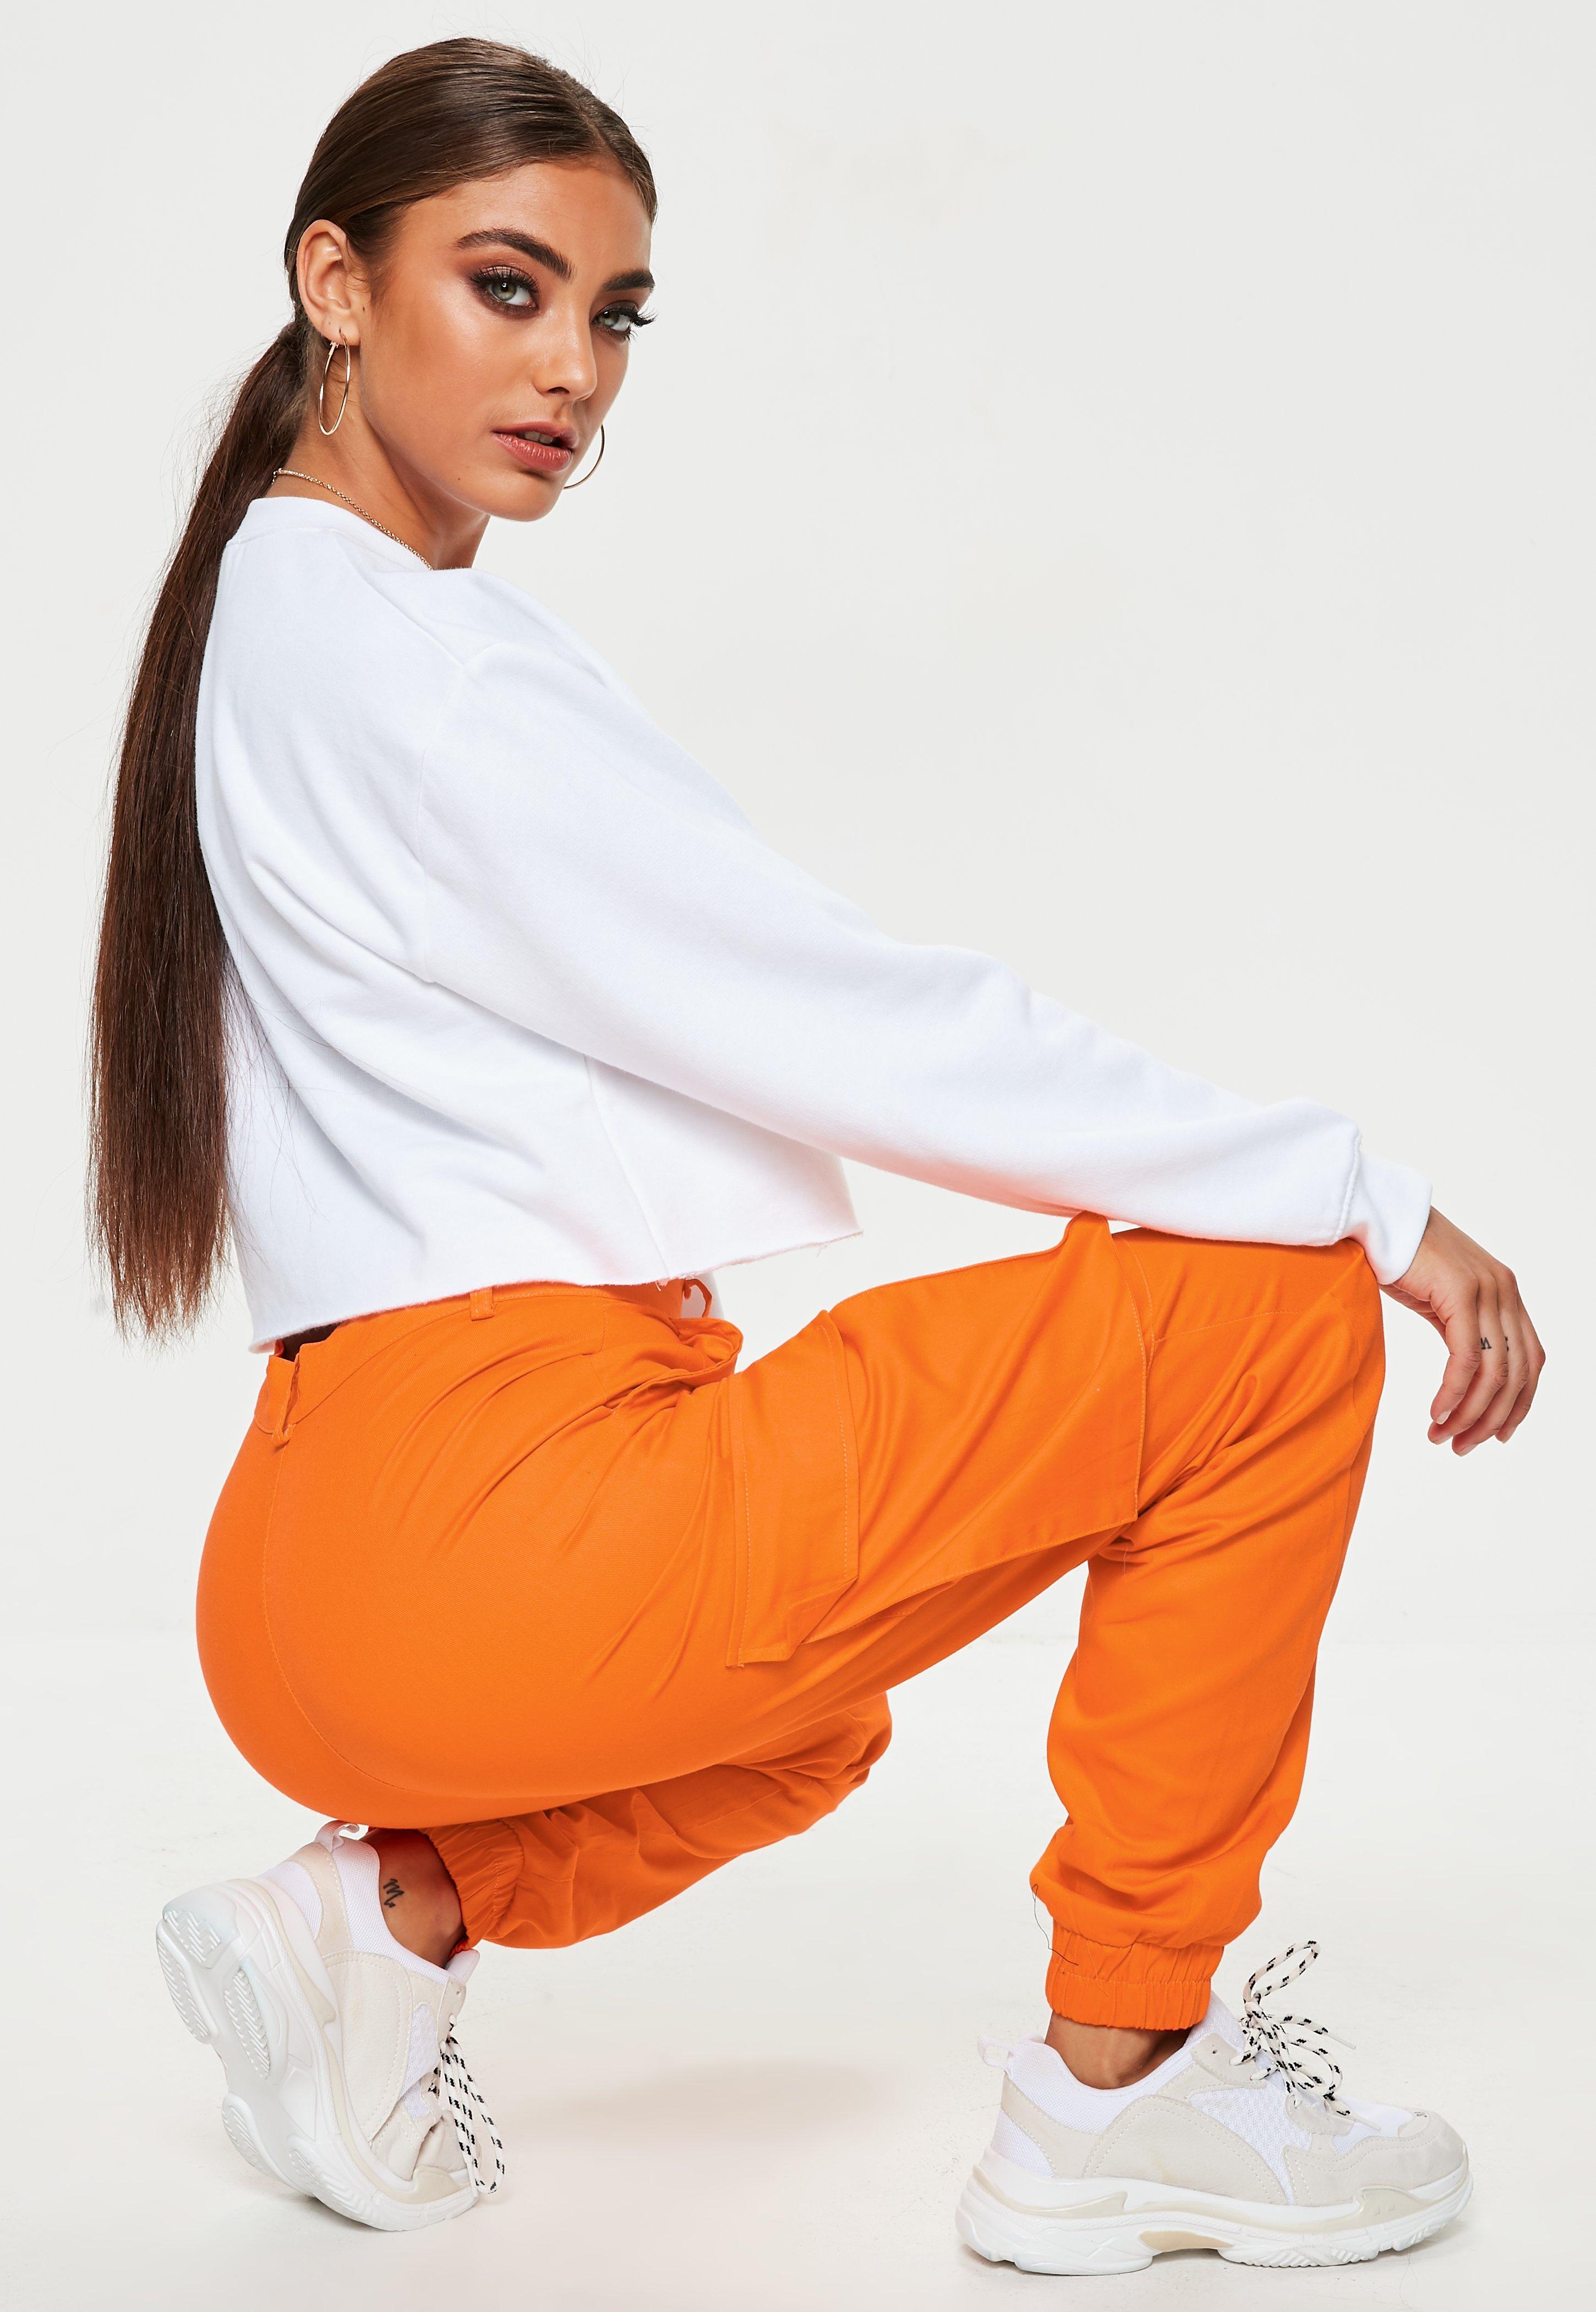 Pantalon femme   Pantalon été en ligne - Missguided e429be2b997e